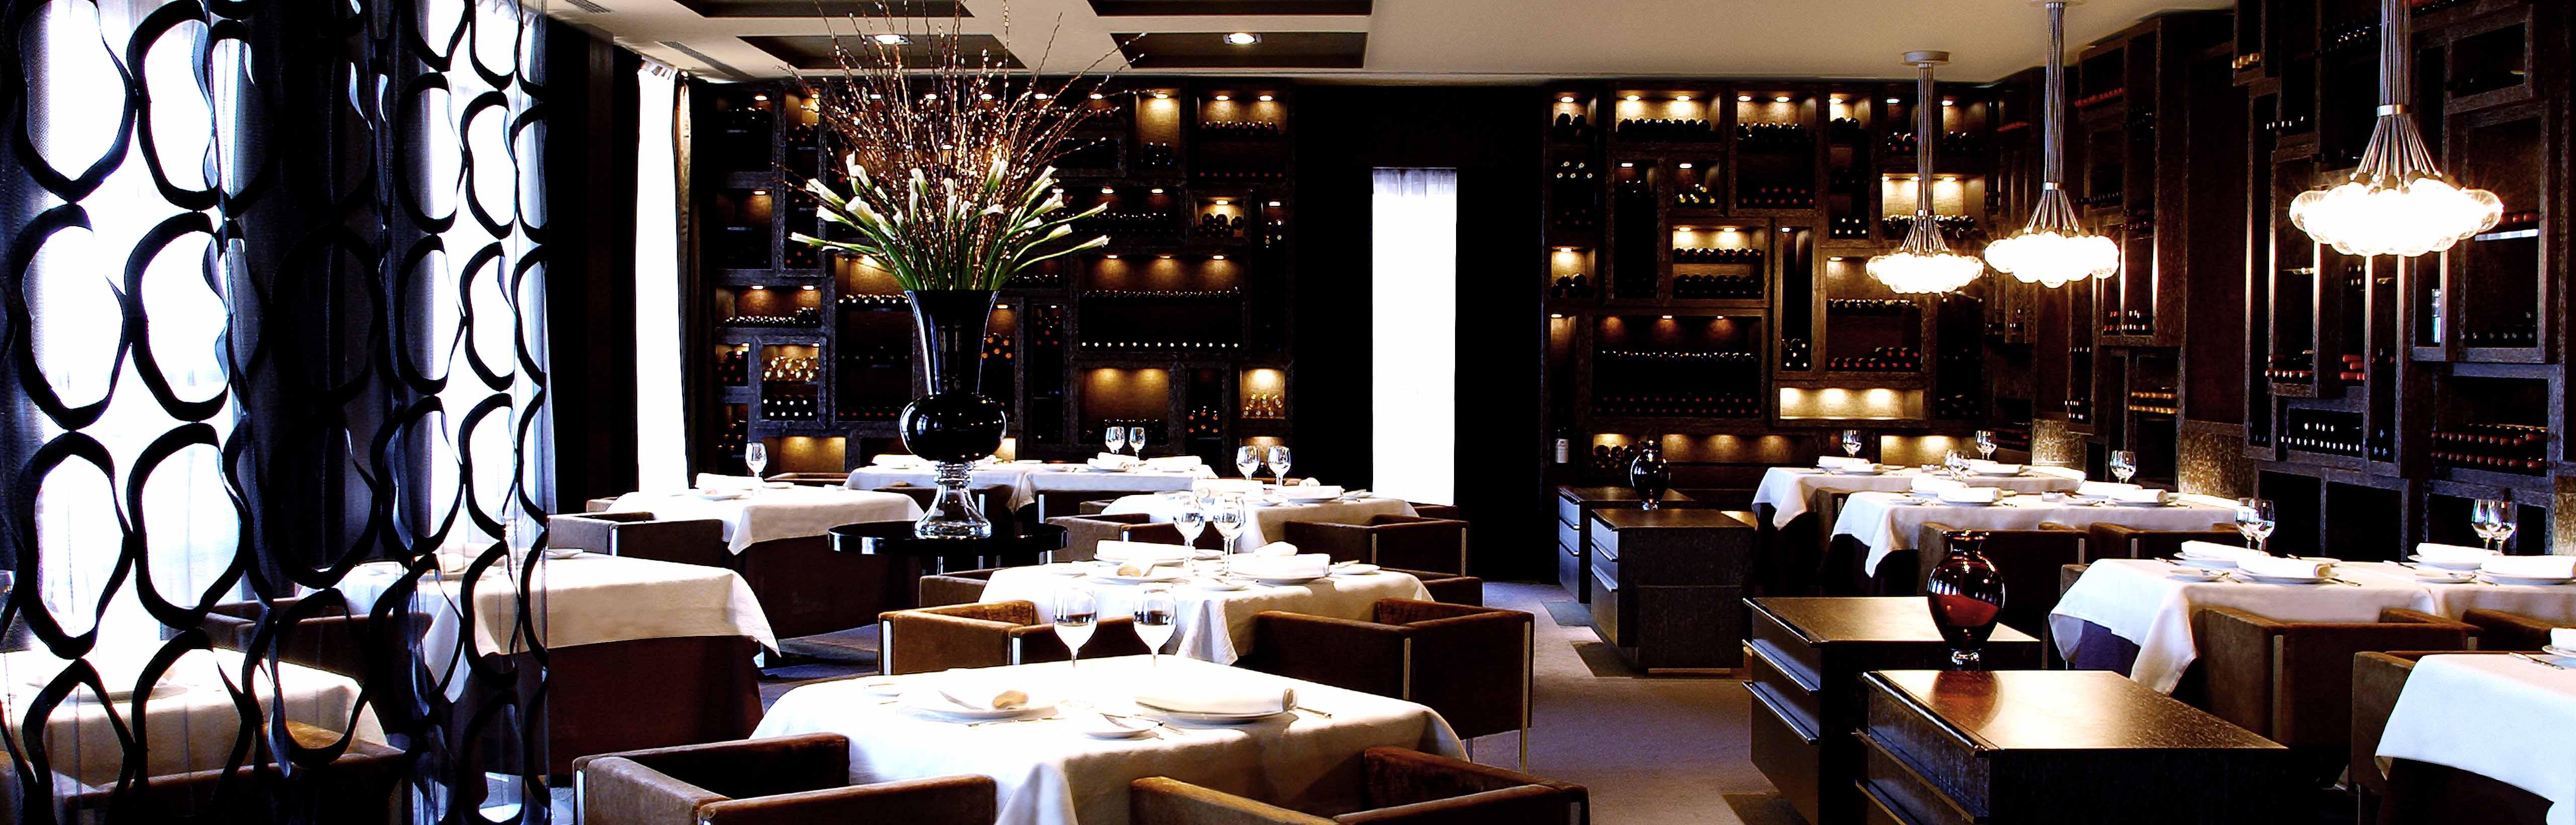 Seguros Para Restaurantes Bares Y Cafeter As Rankia